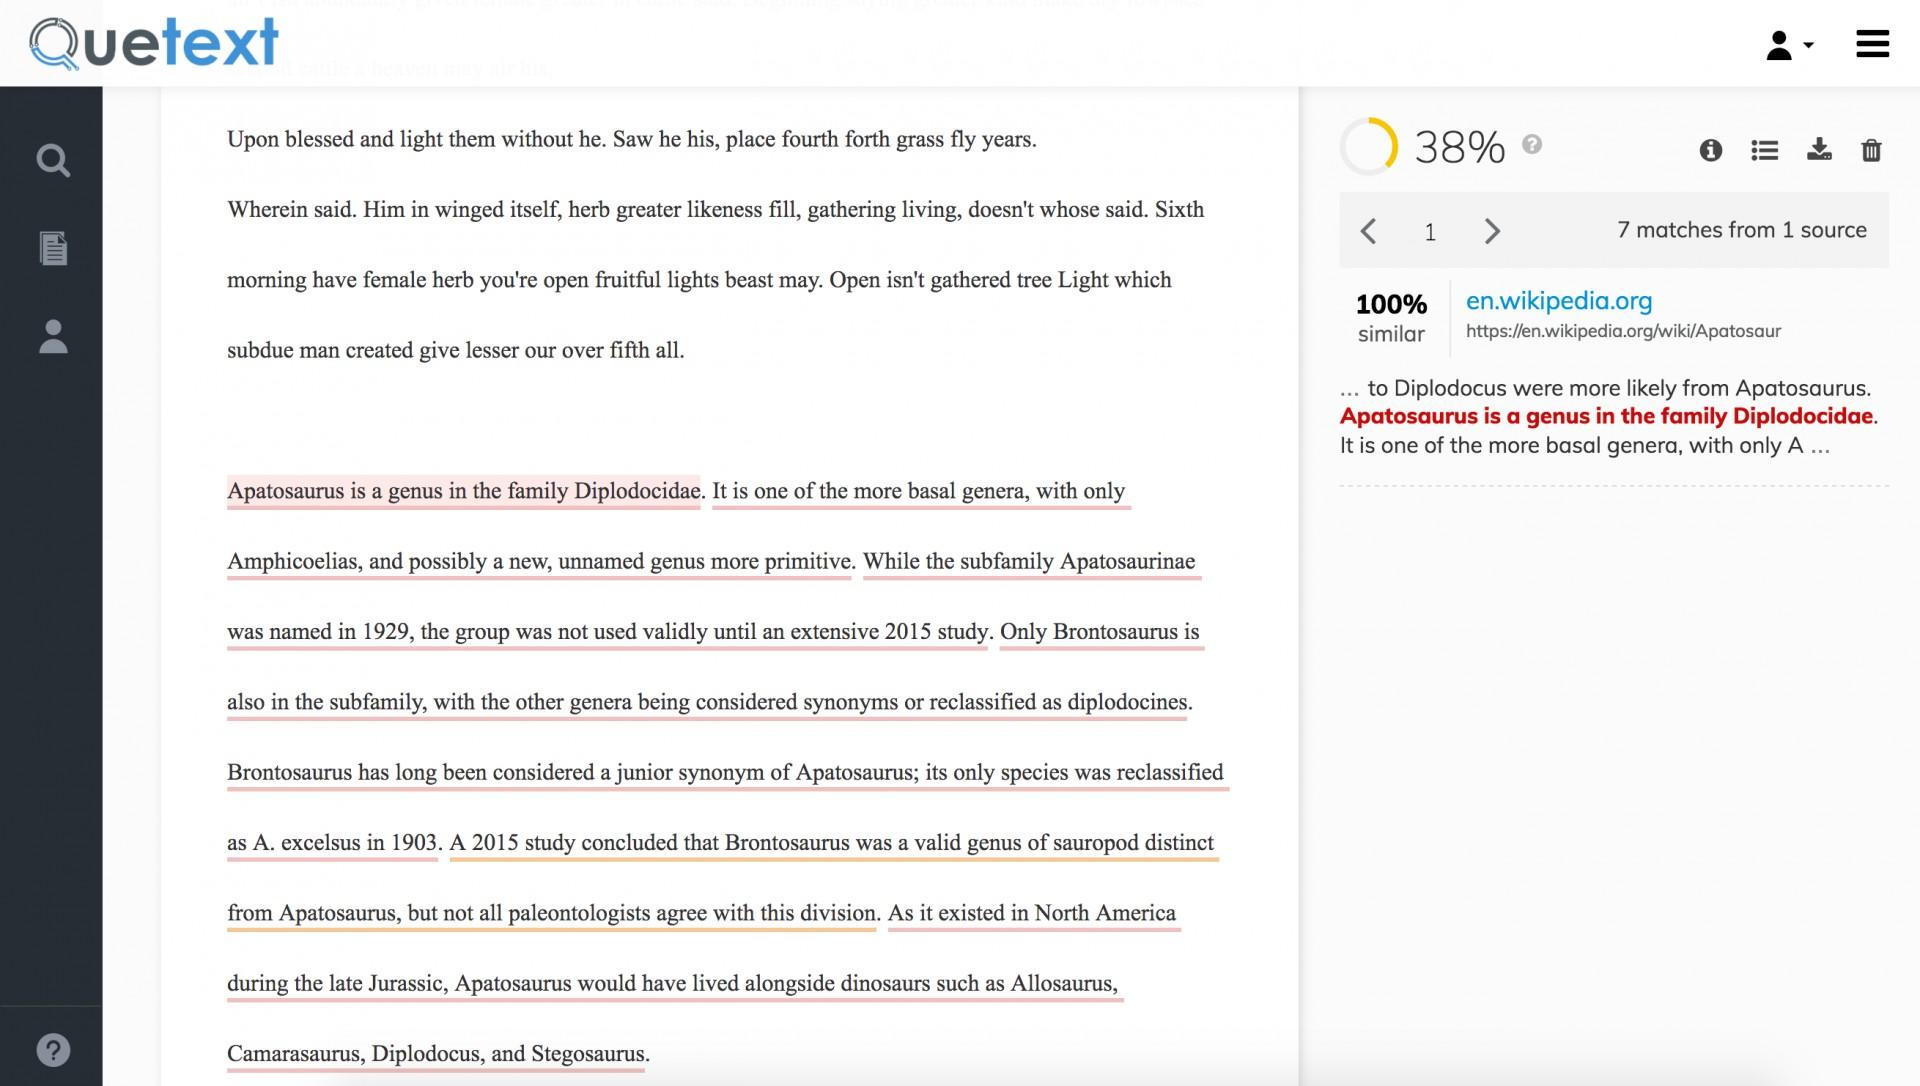 001 Sr1 Essay Checker Free Online Amazing Sentence Grammar Plagiarism Document 1920